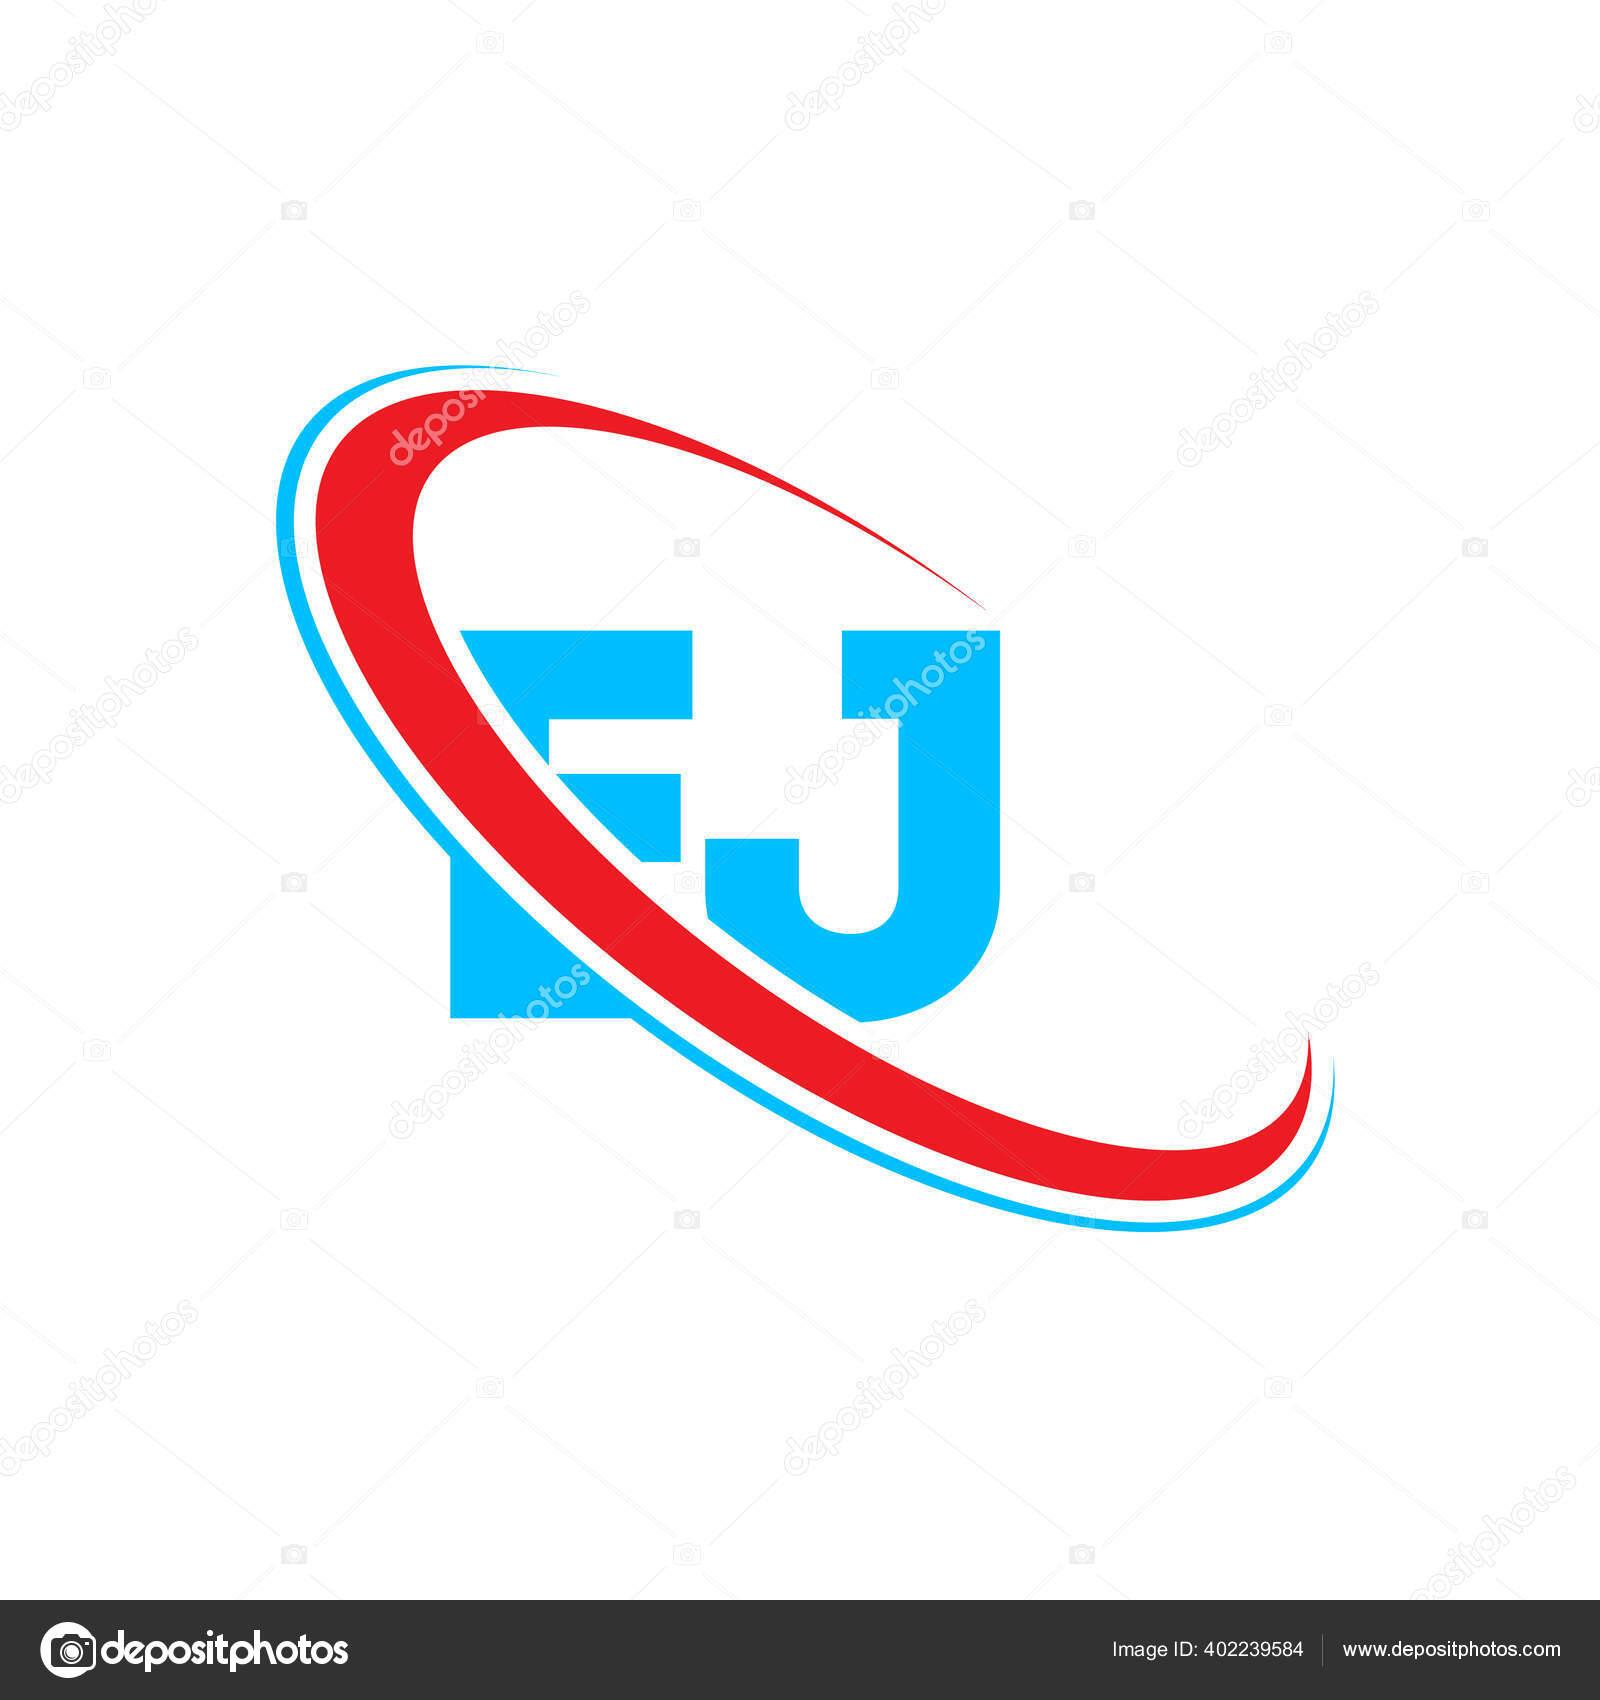 Desain Logo Huruf Huruf Awal Ejlinked Lingkaran Upercase Logo Monogram Stok Vektor C Mamuntwofiveg 402239584